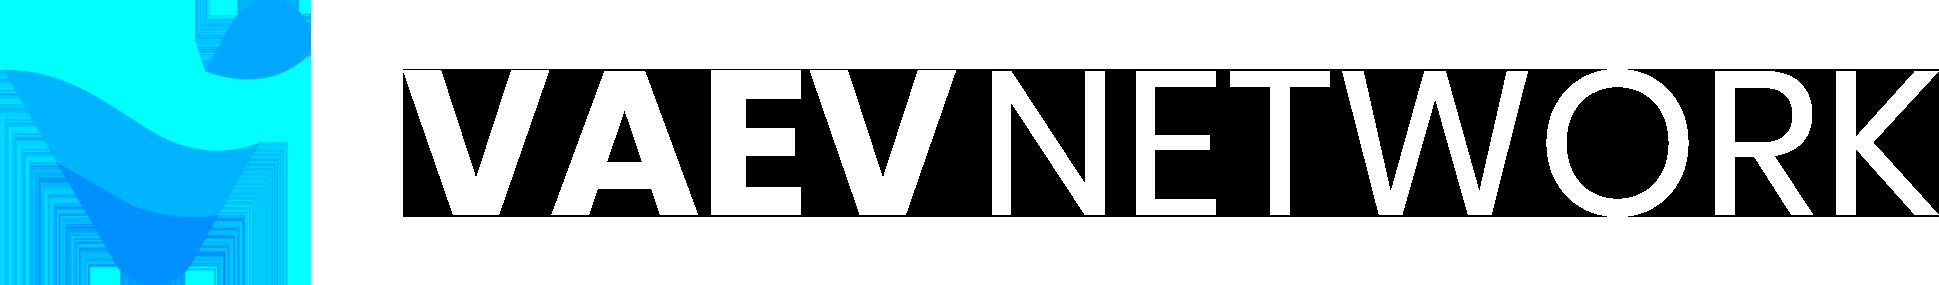 Vaev Network